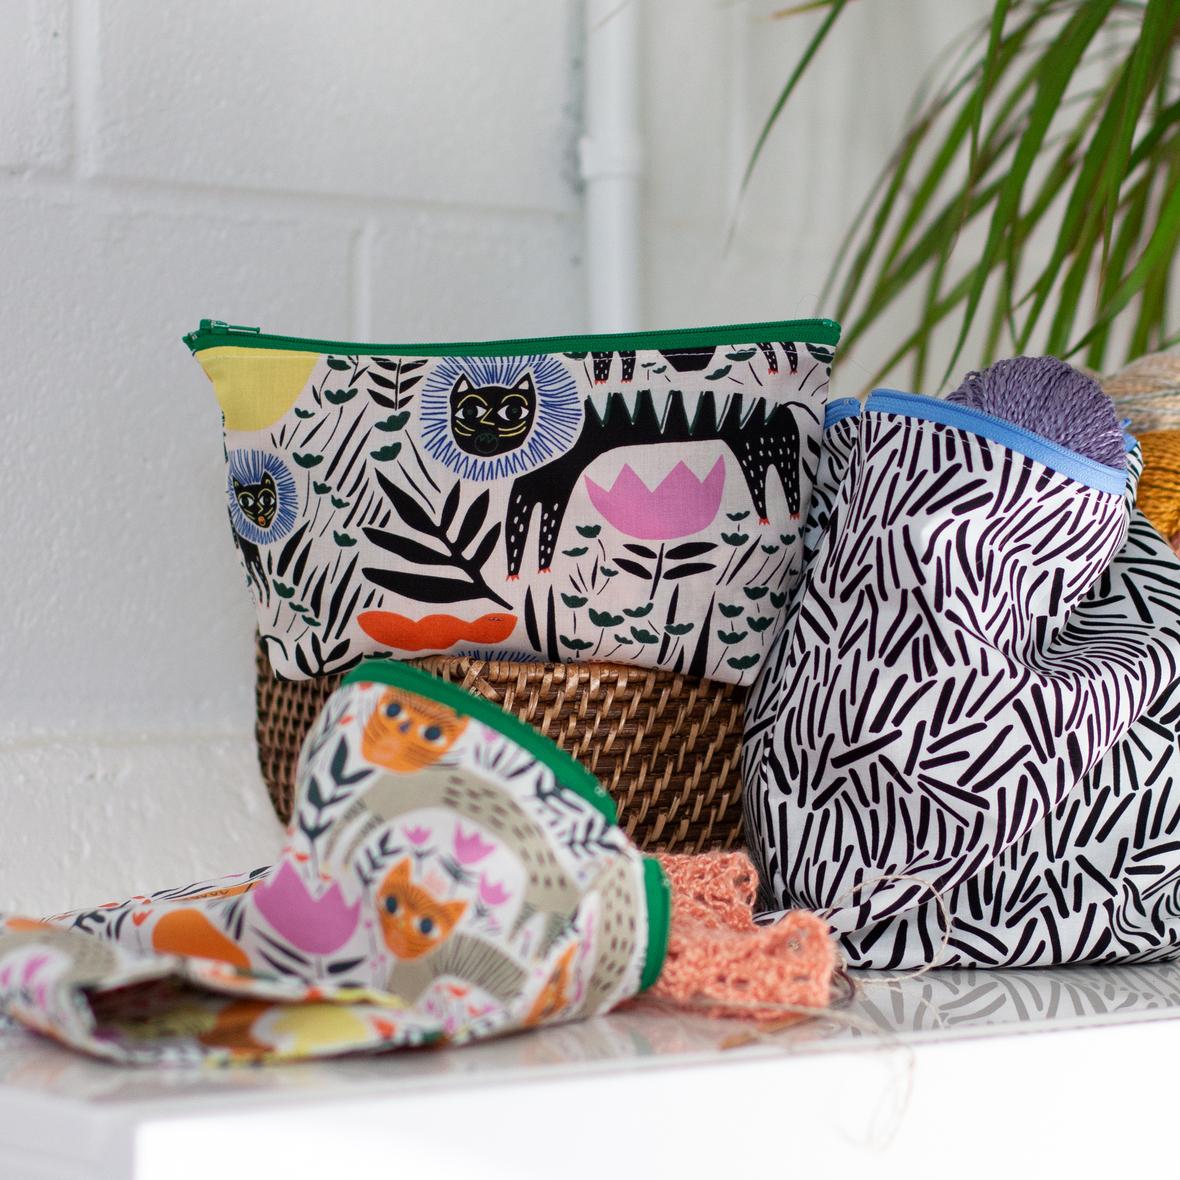 C9 website- wild-yarn-bags - inspiration